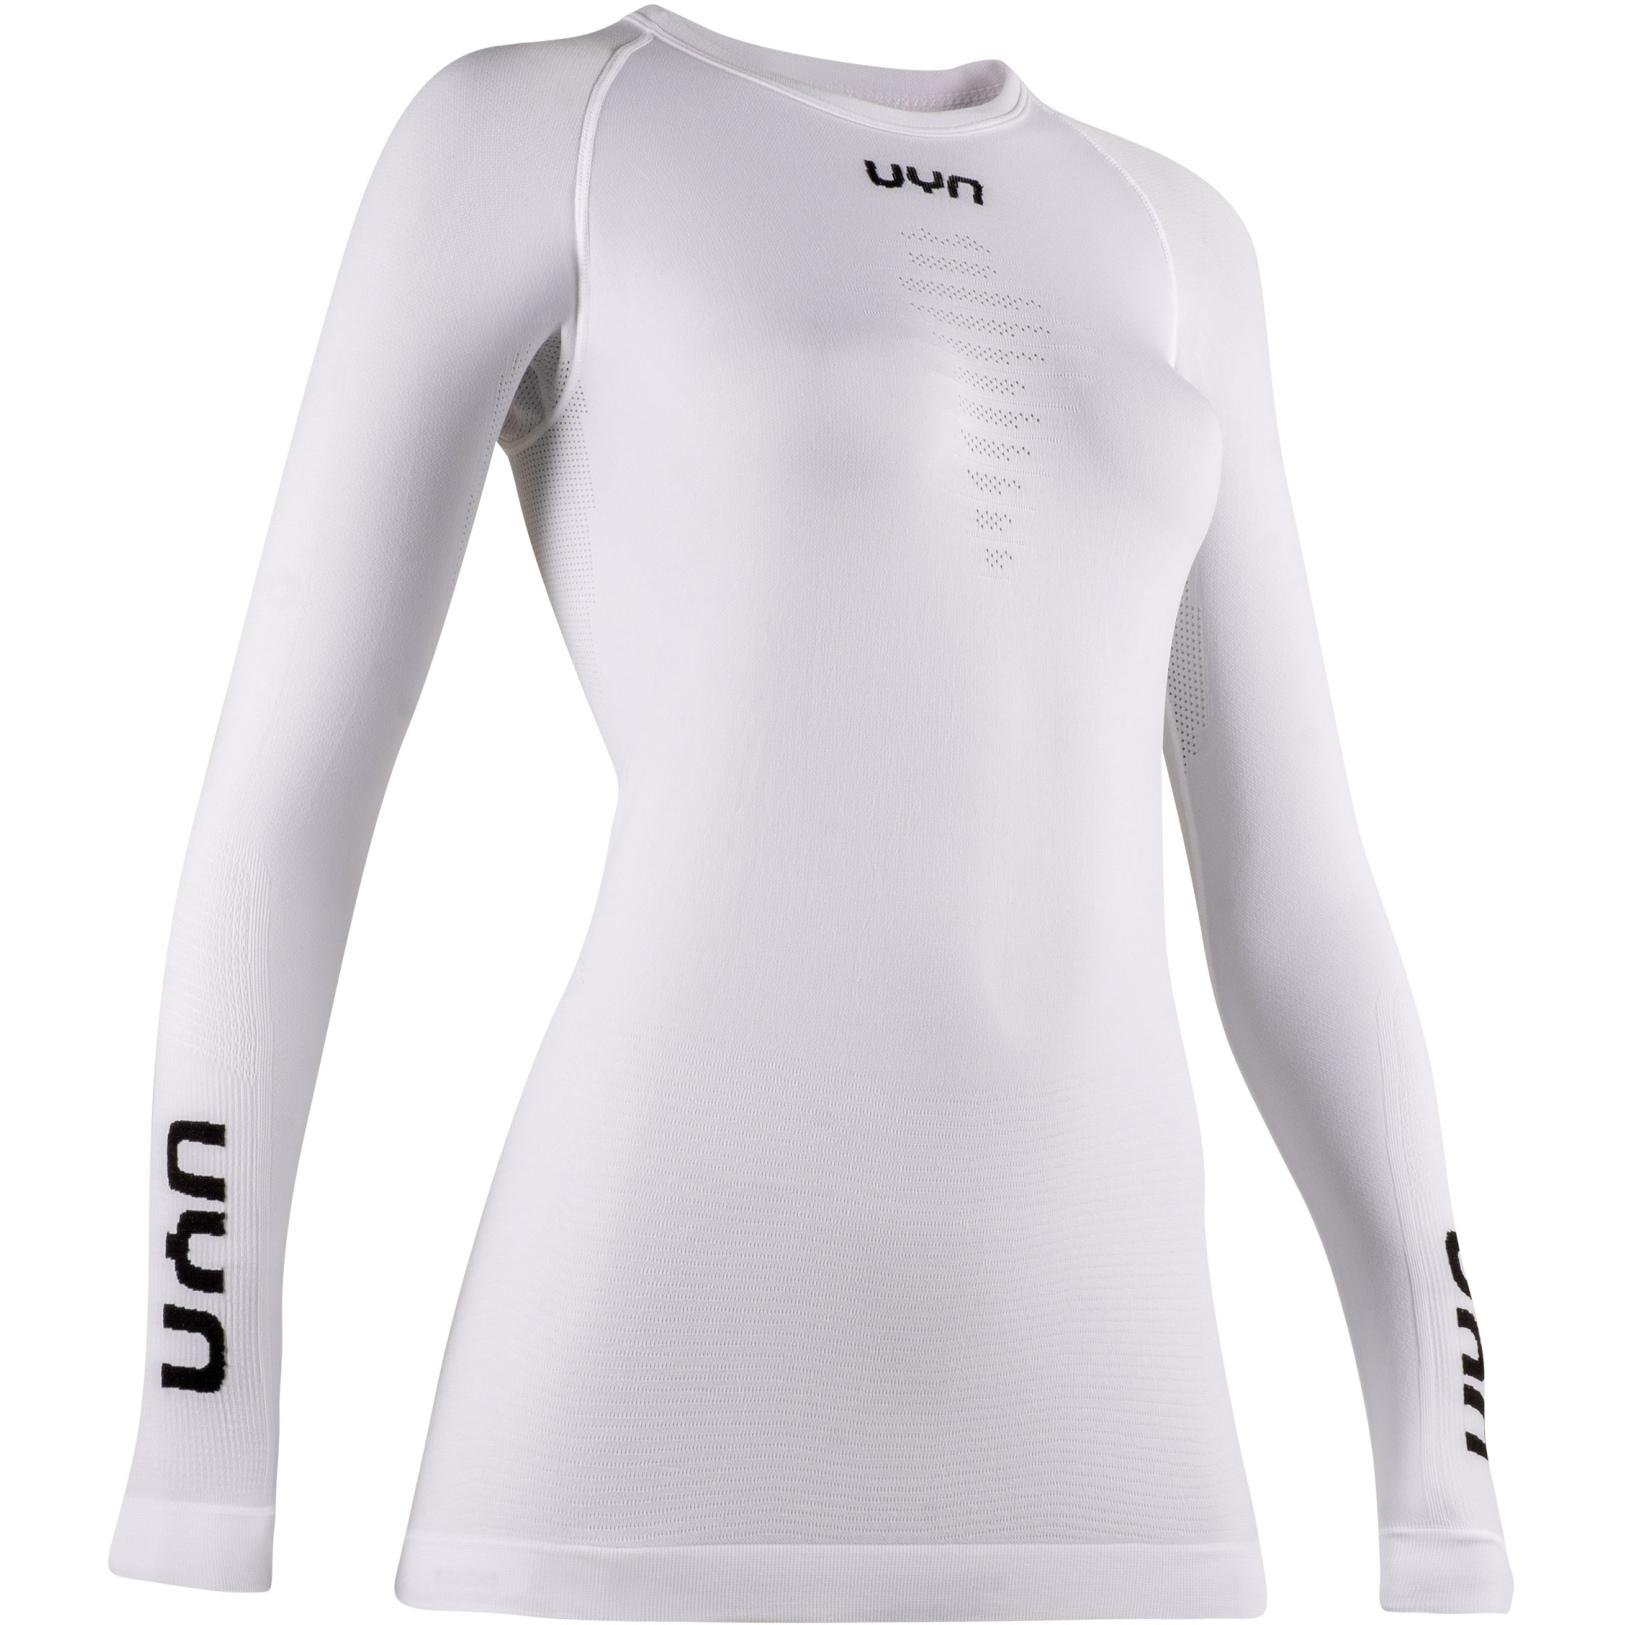 Image of UYN Energyon Lady Long Sleeve Underwear Shirt - White